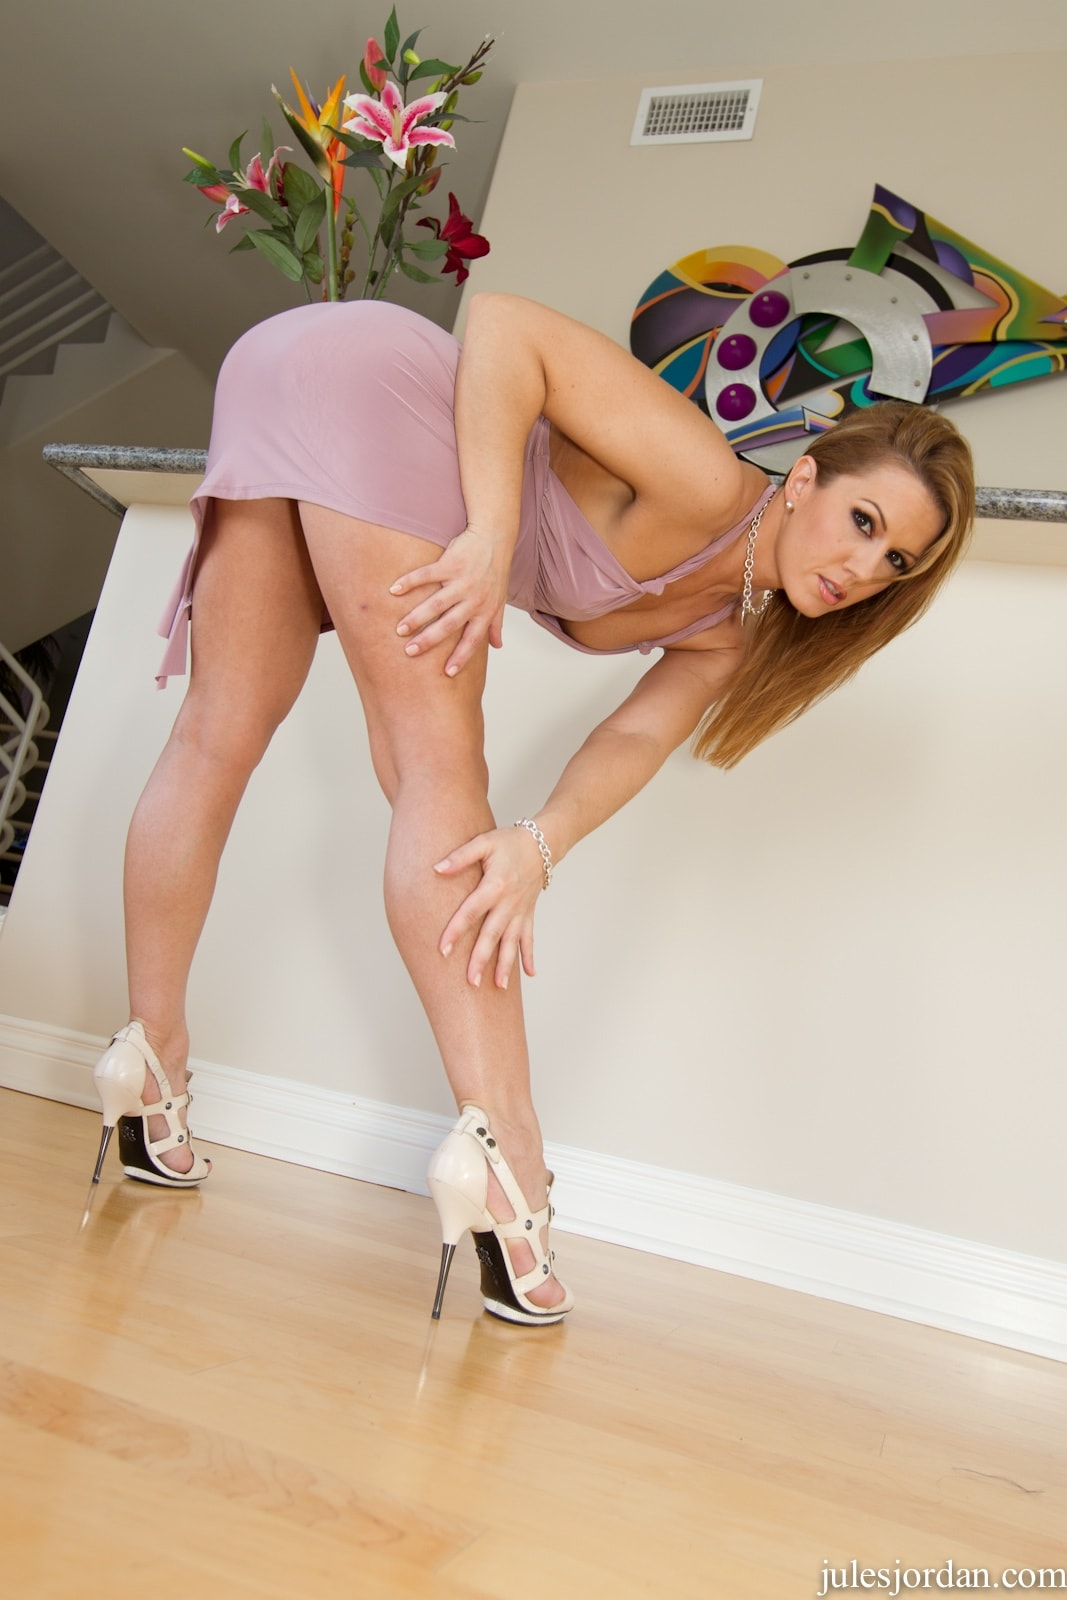 Jules Jordan 'Filthy Anal Housewife' starring Inari Vachs (Photo 2)